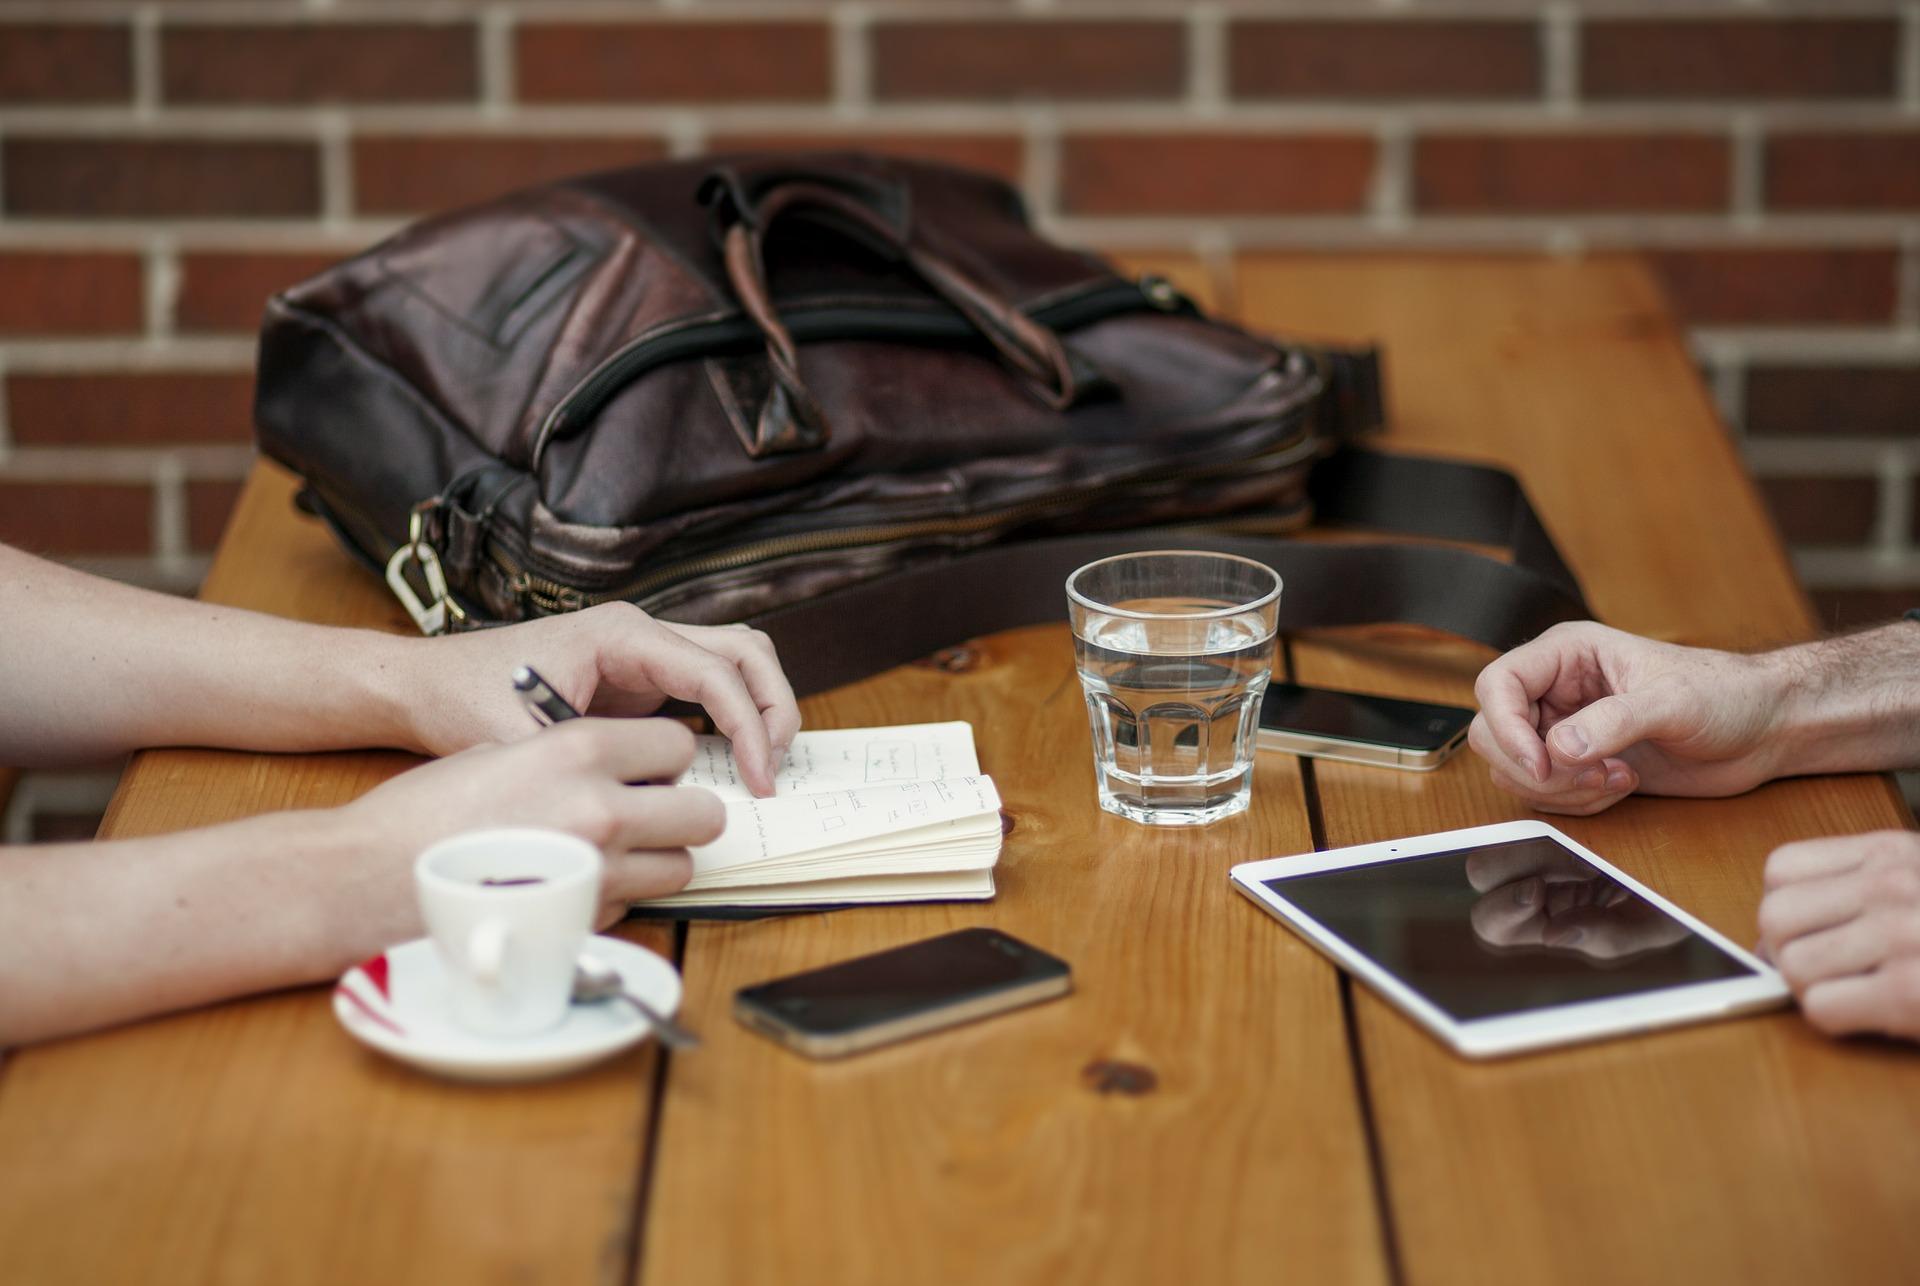 partner, netzwerken, geben, nehmen, meeting, geschenk, networking, smalltalk